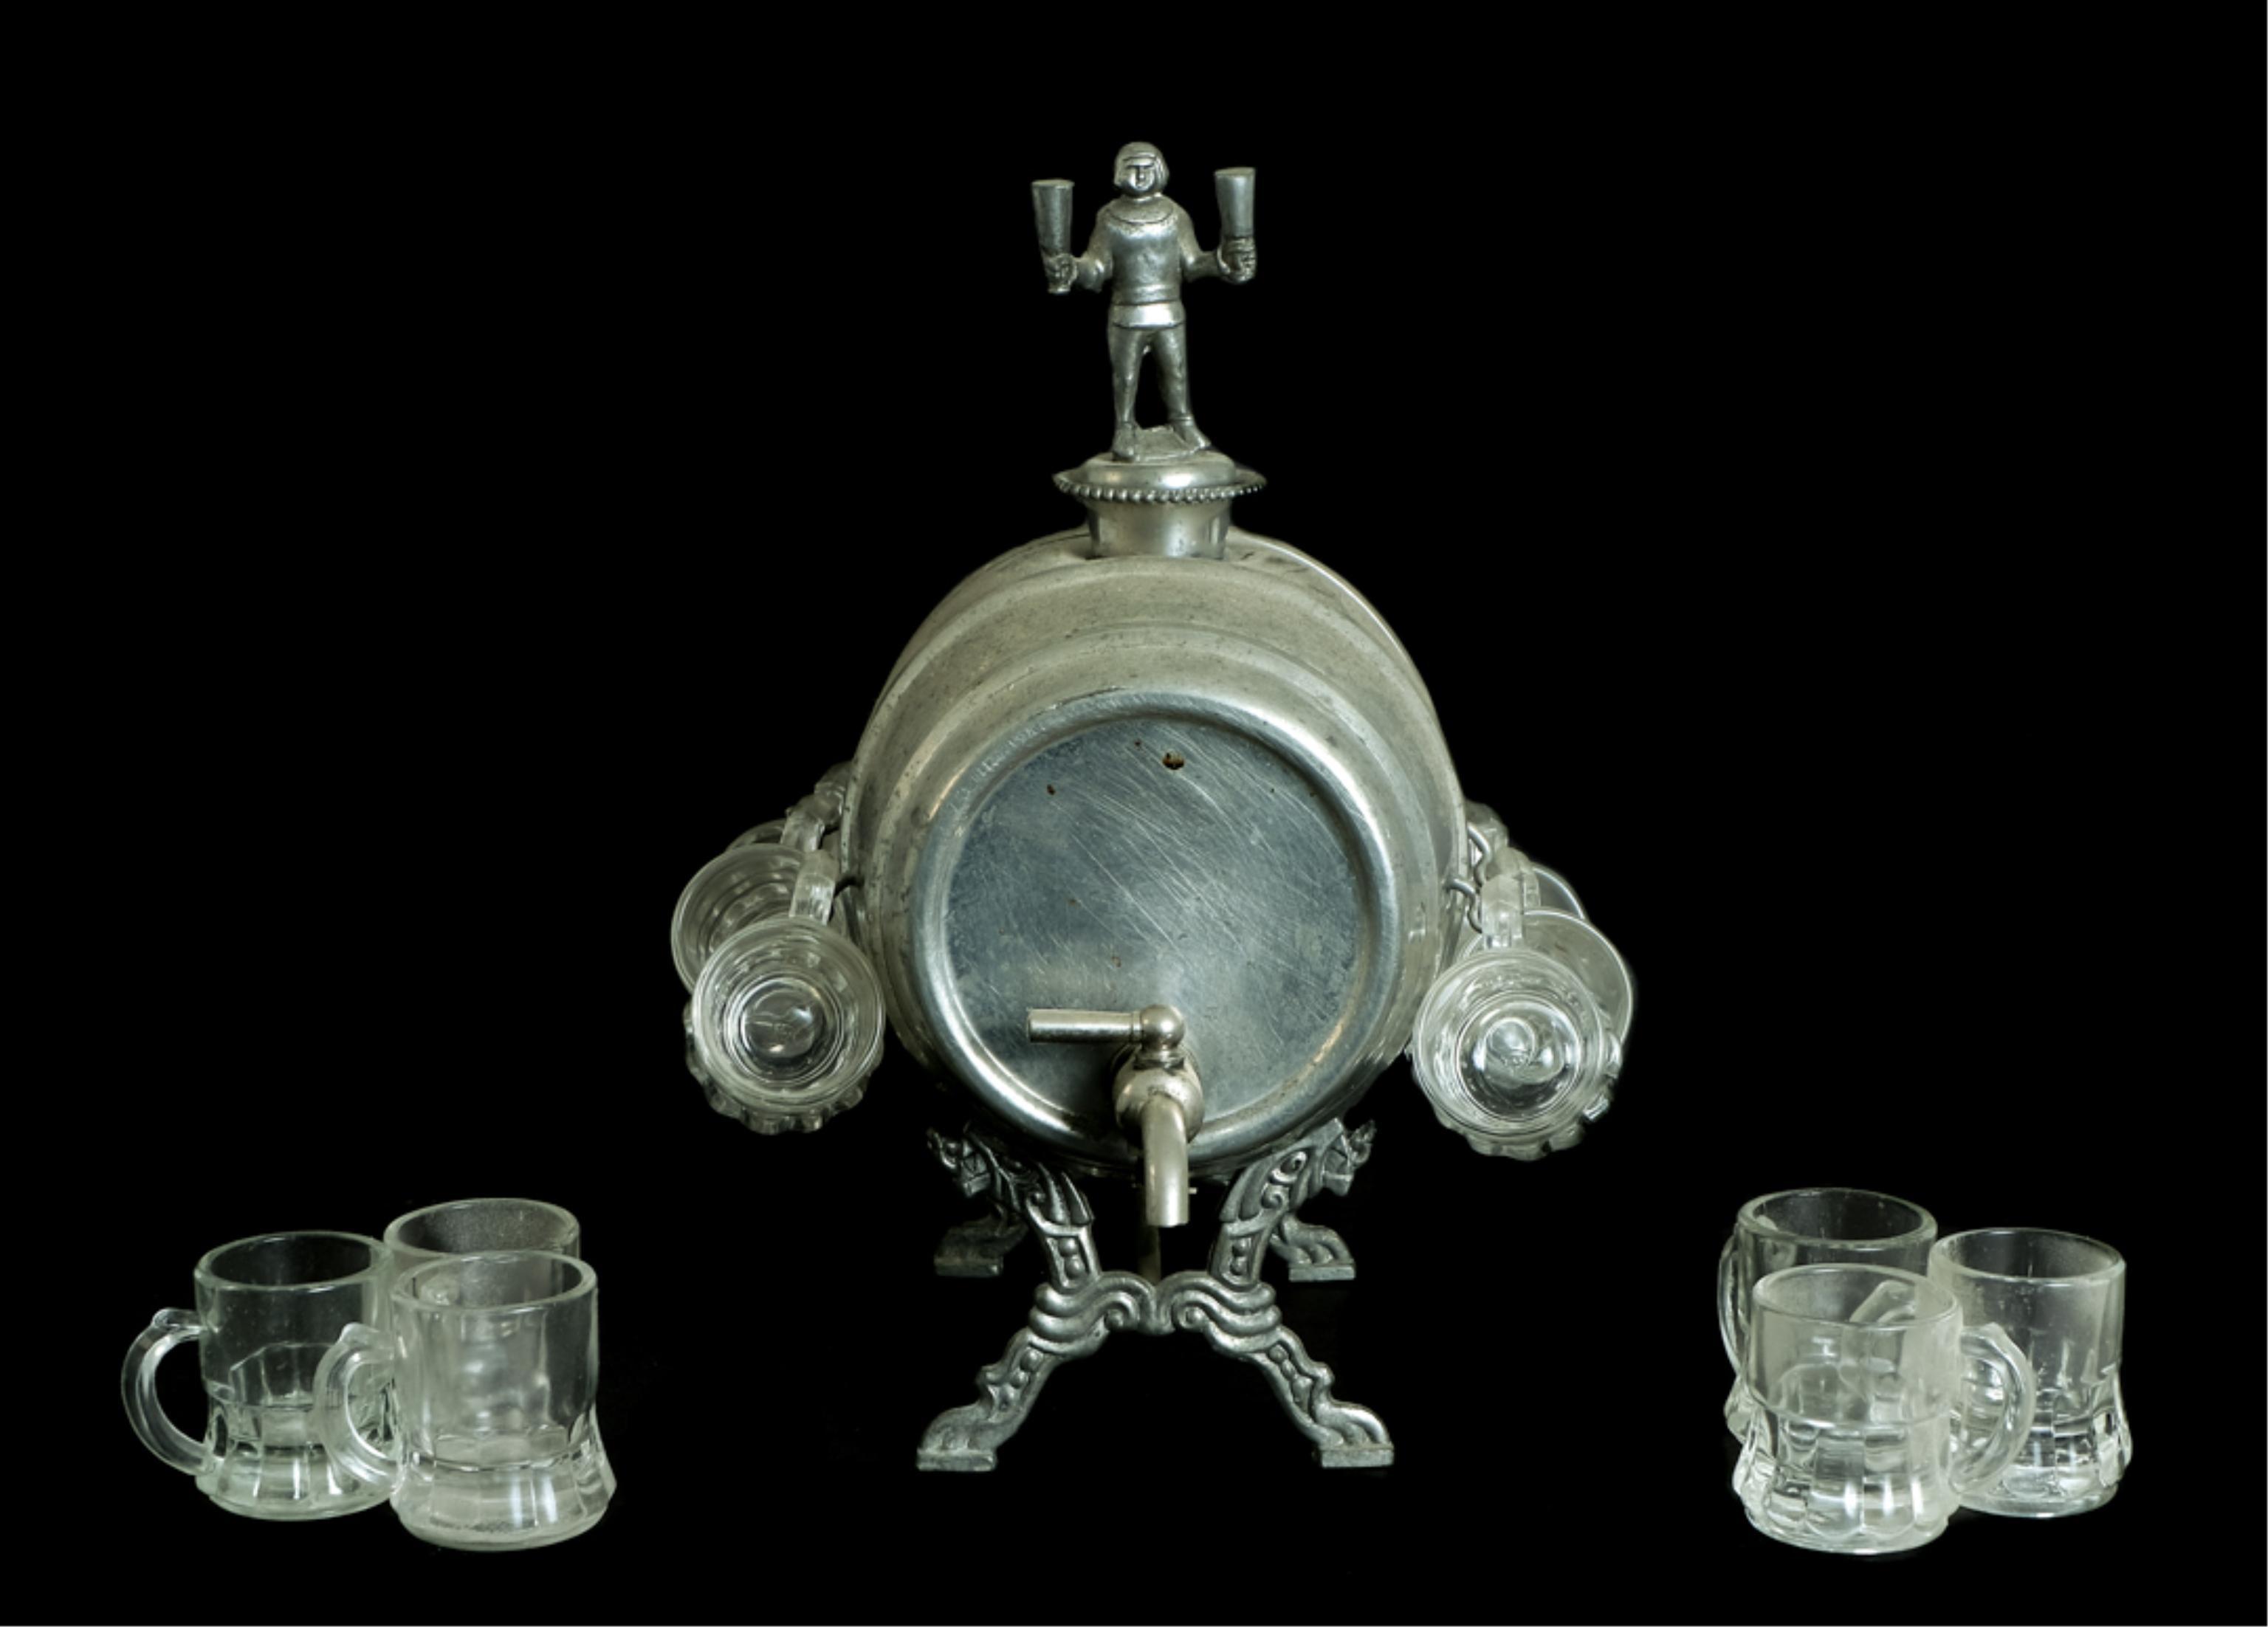 Vintage Figural Silver Whiskey Barrel Mug Display